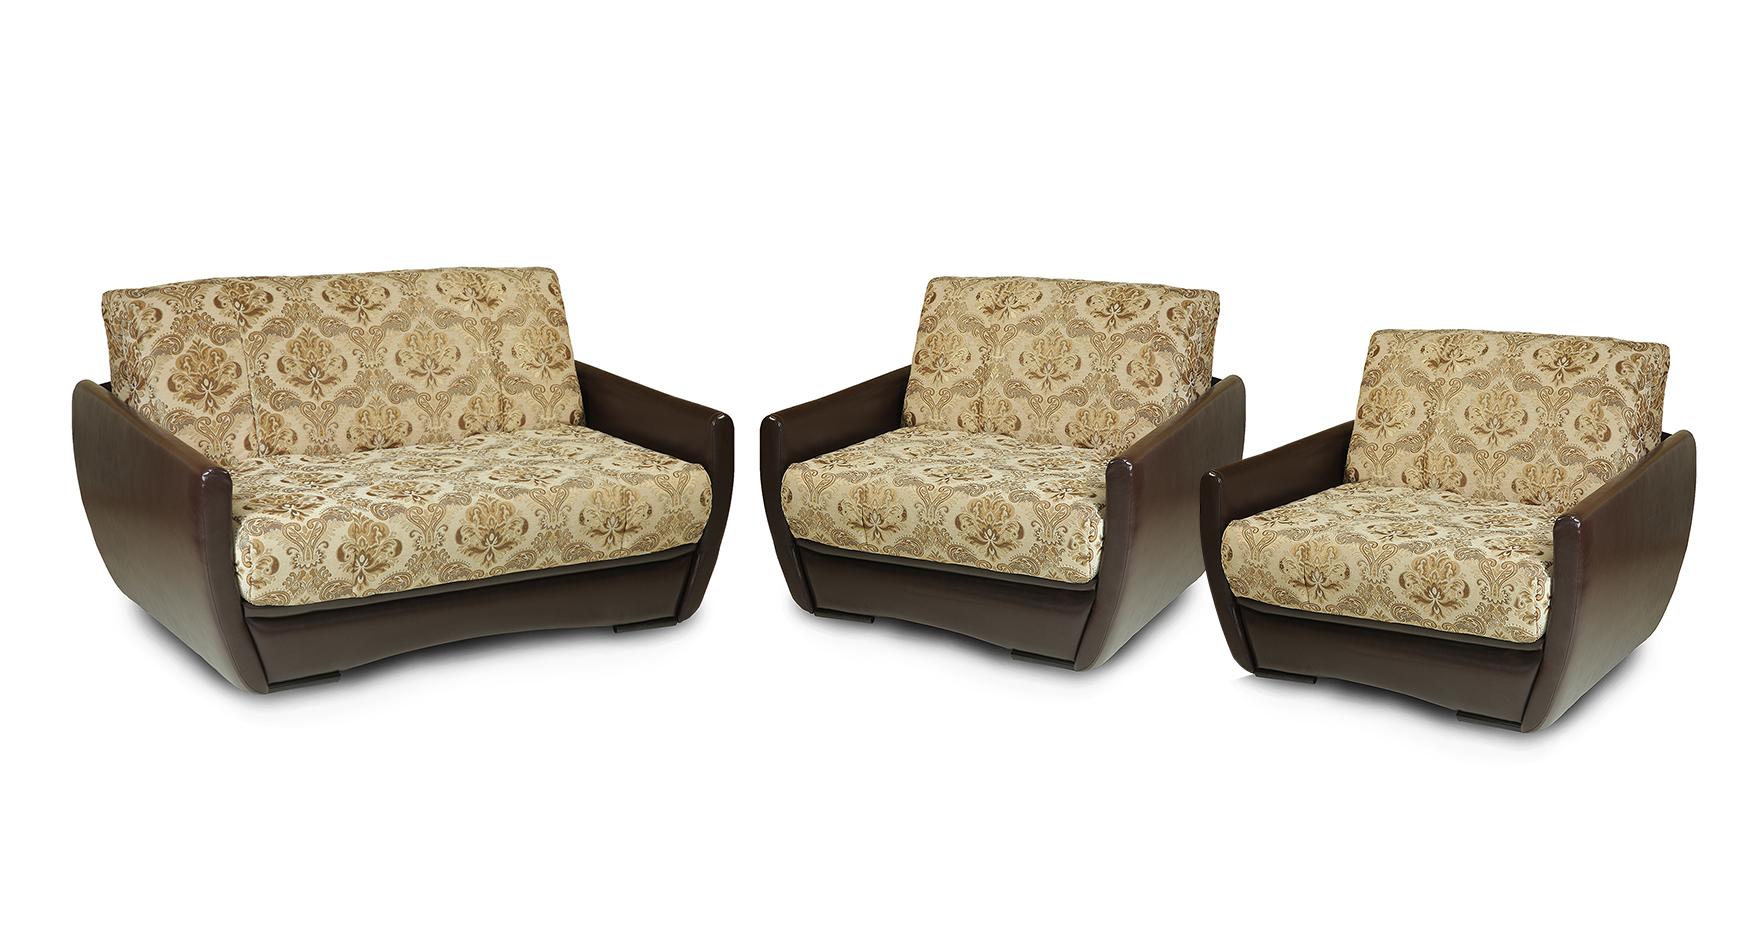 Комплект мягкой мебели Монро-2 фото